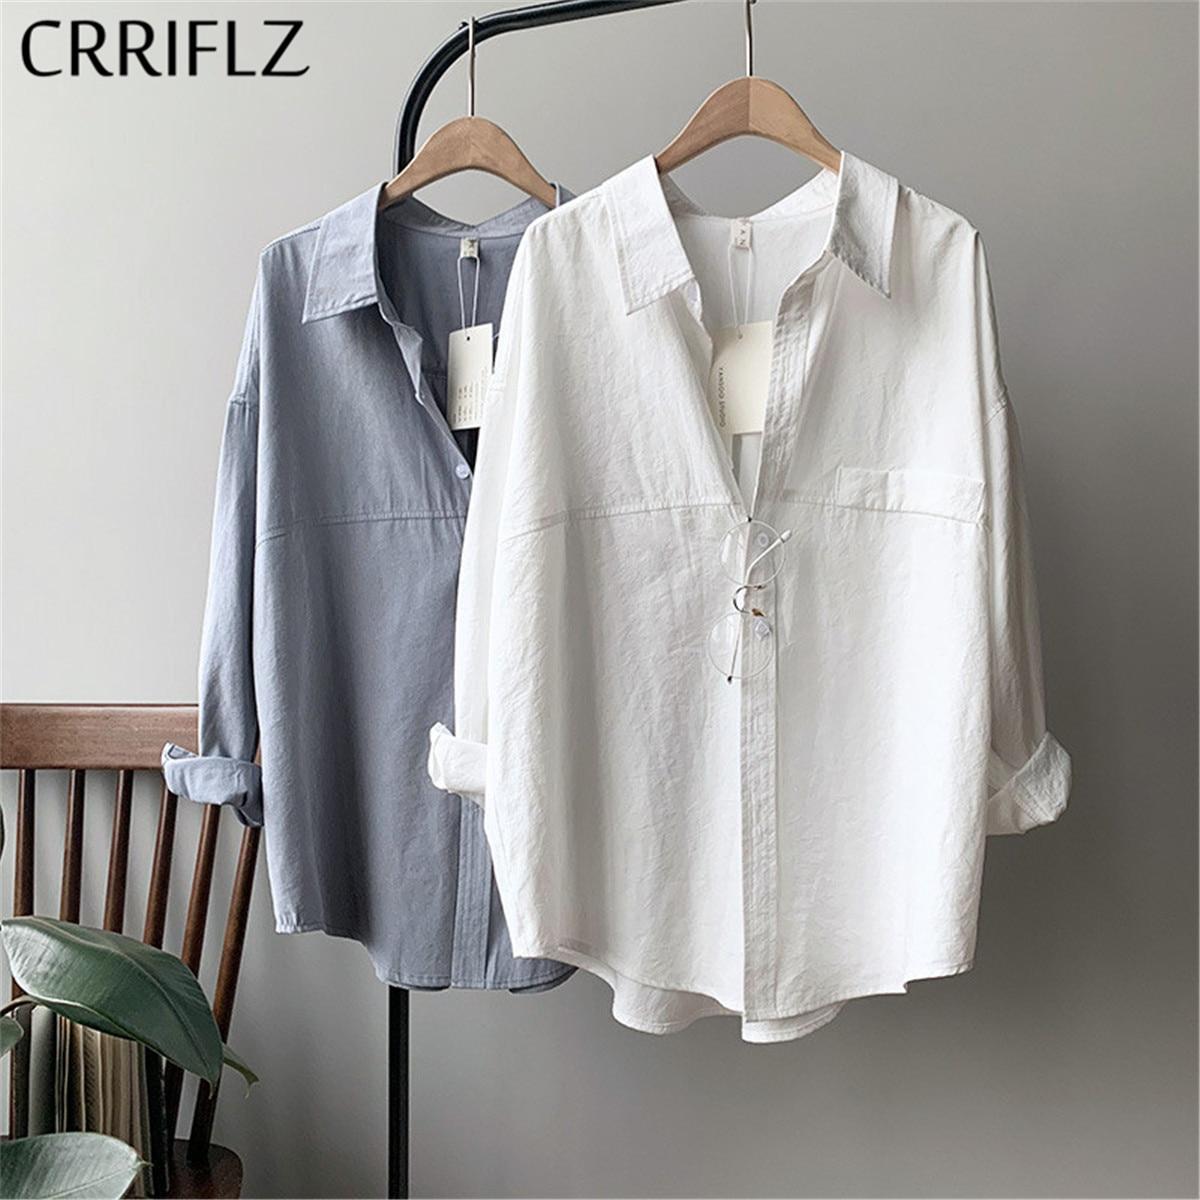 crriflz womens cotton feel shirt imitation suede 2